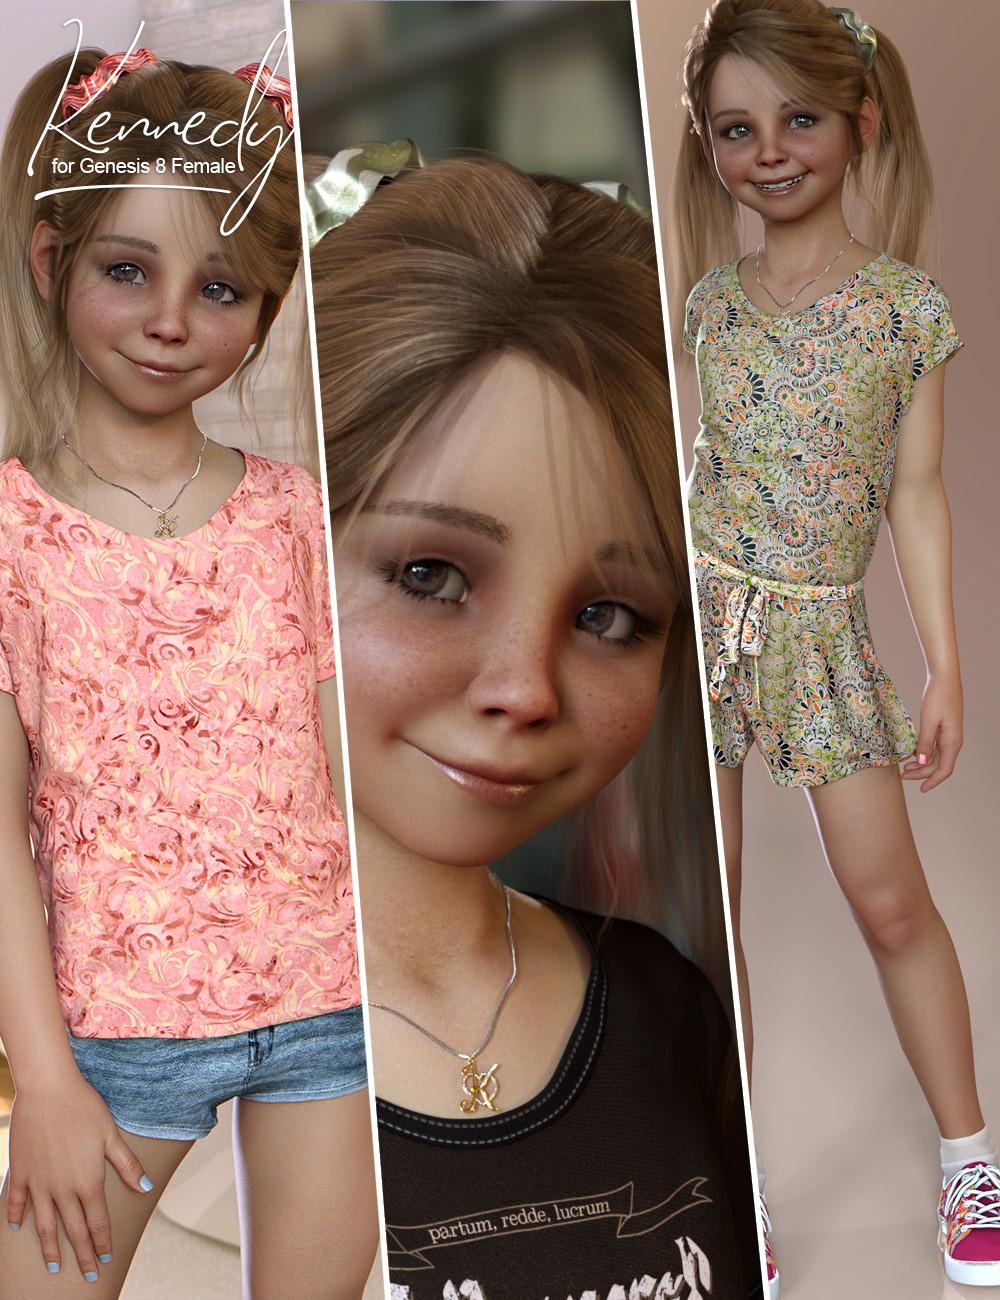 Kennedy Bundle for Genesis 8 Female(s) by: 3D Universe, 3D Models by Daz 3D